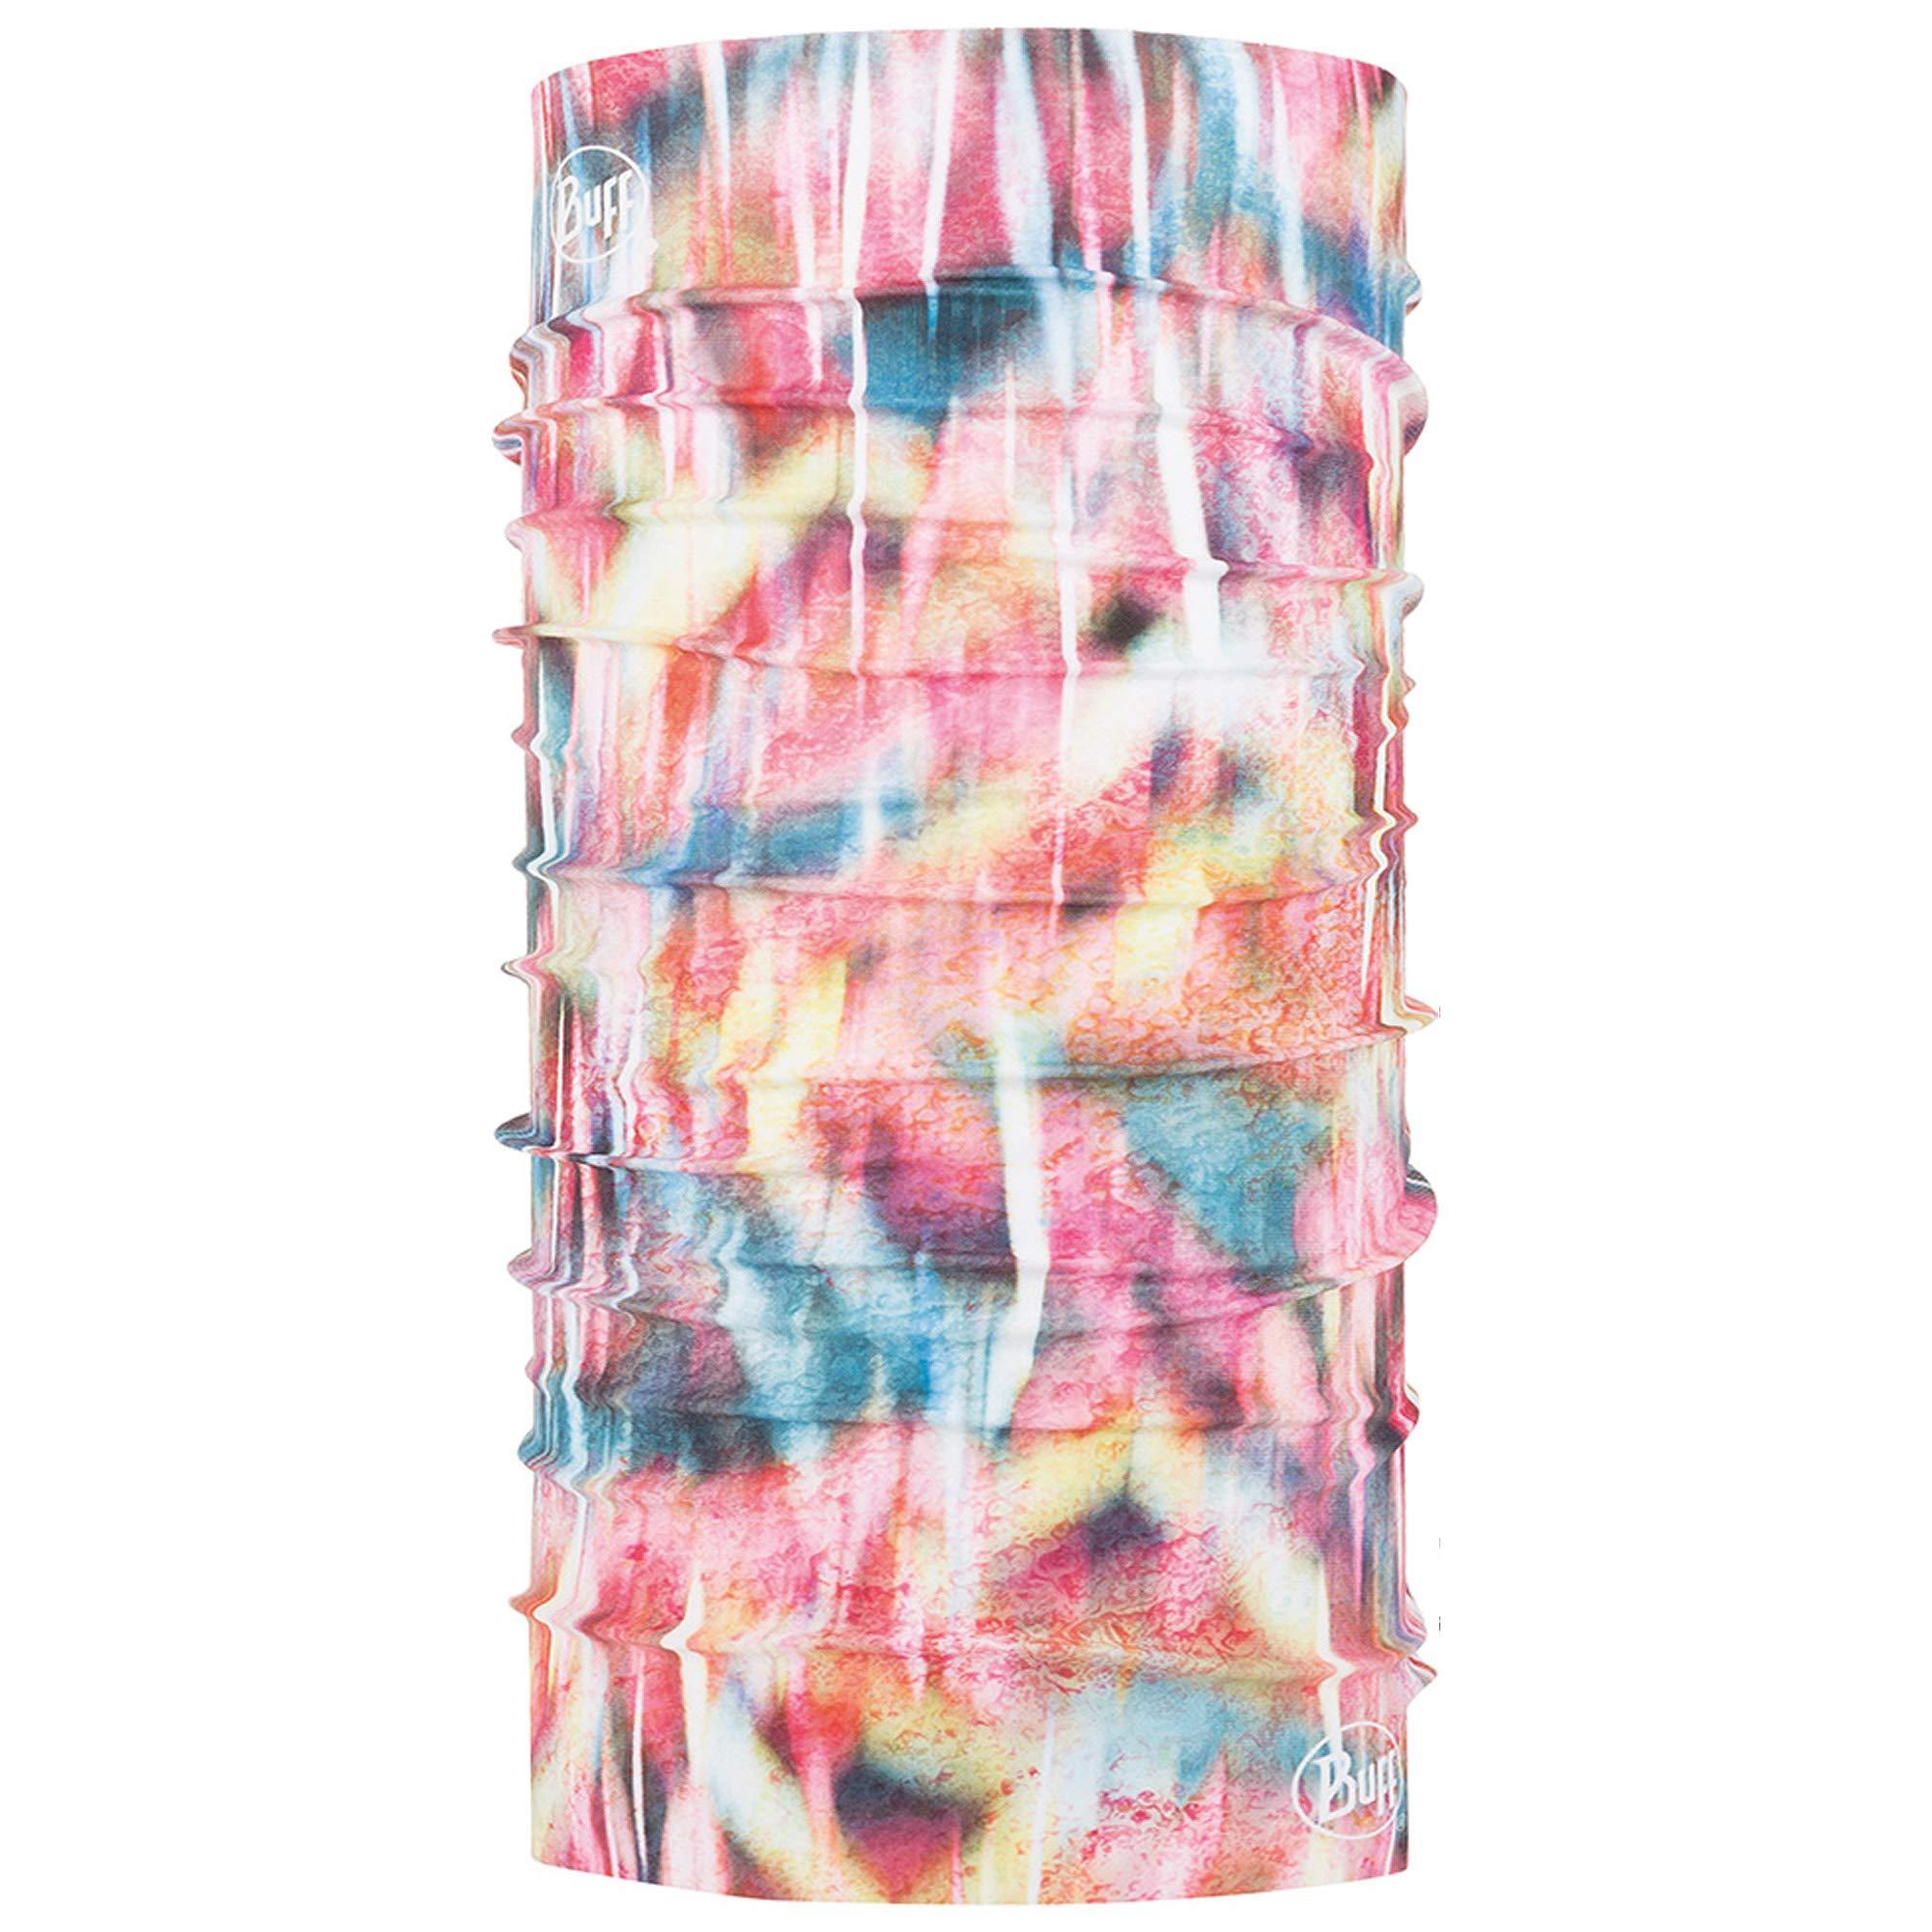 Buff Original Tie Dye Prints Shimmer, One Size